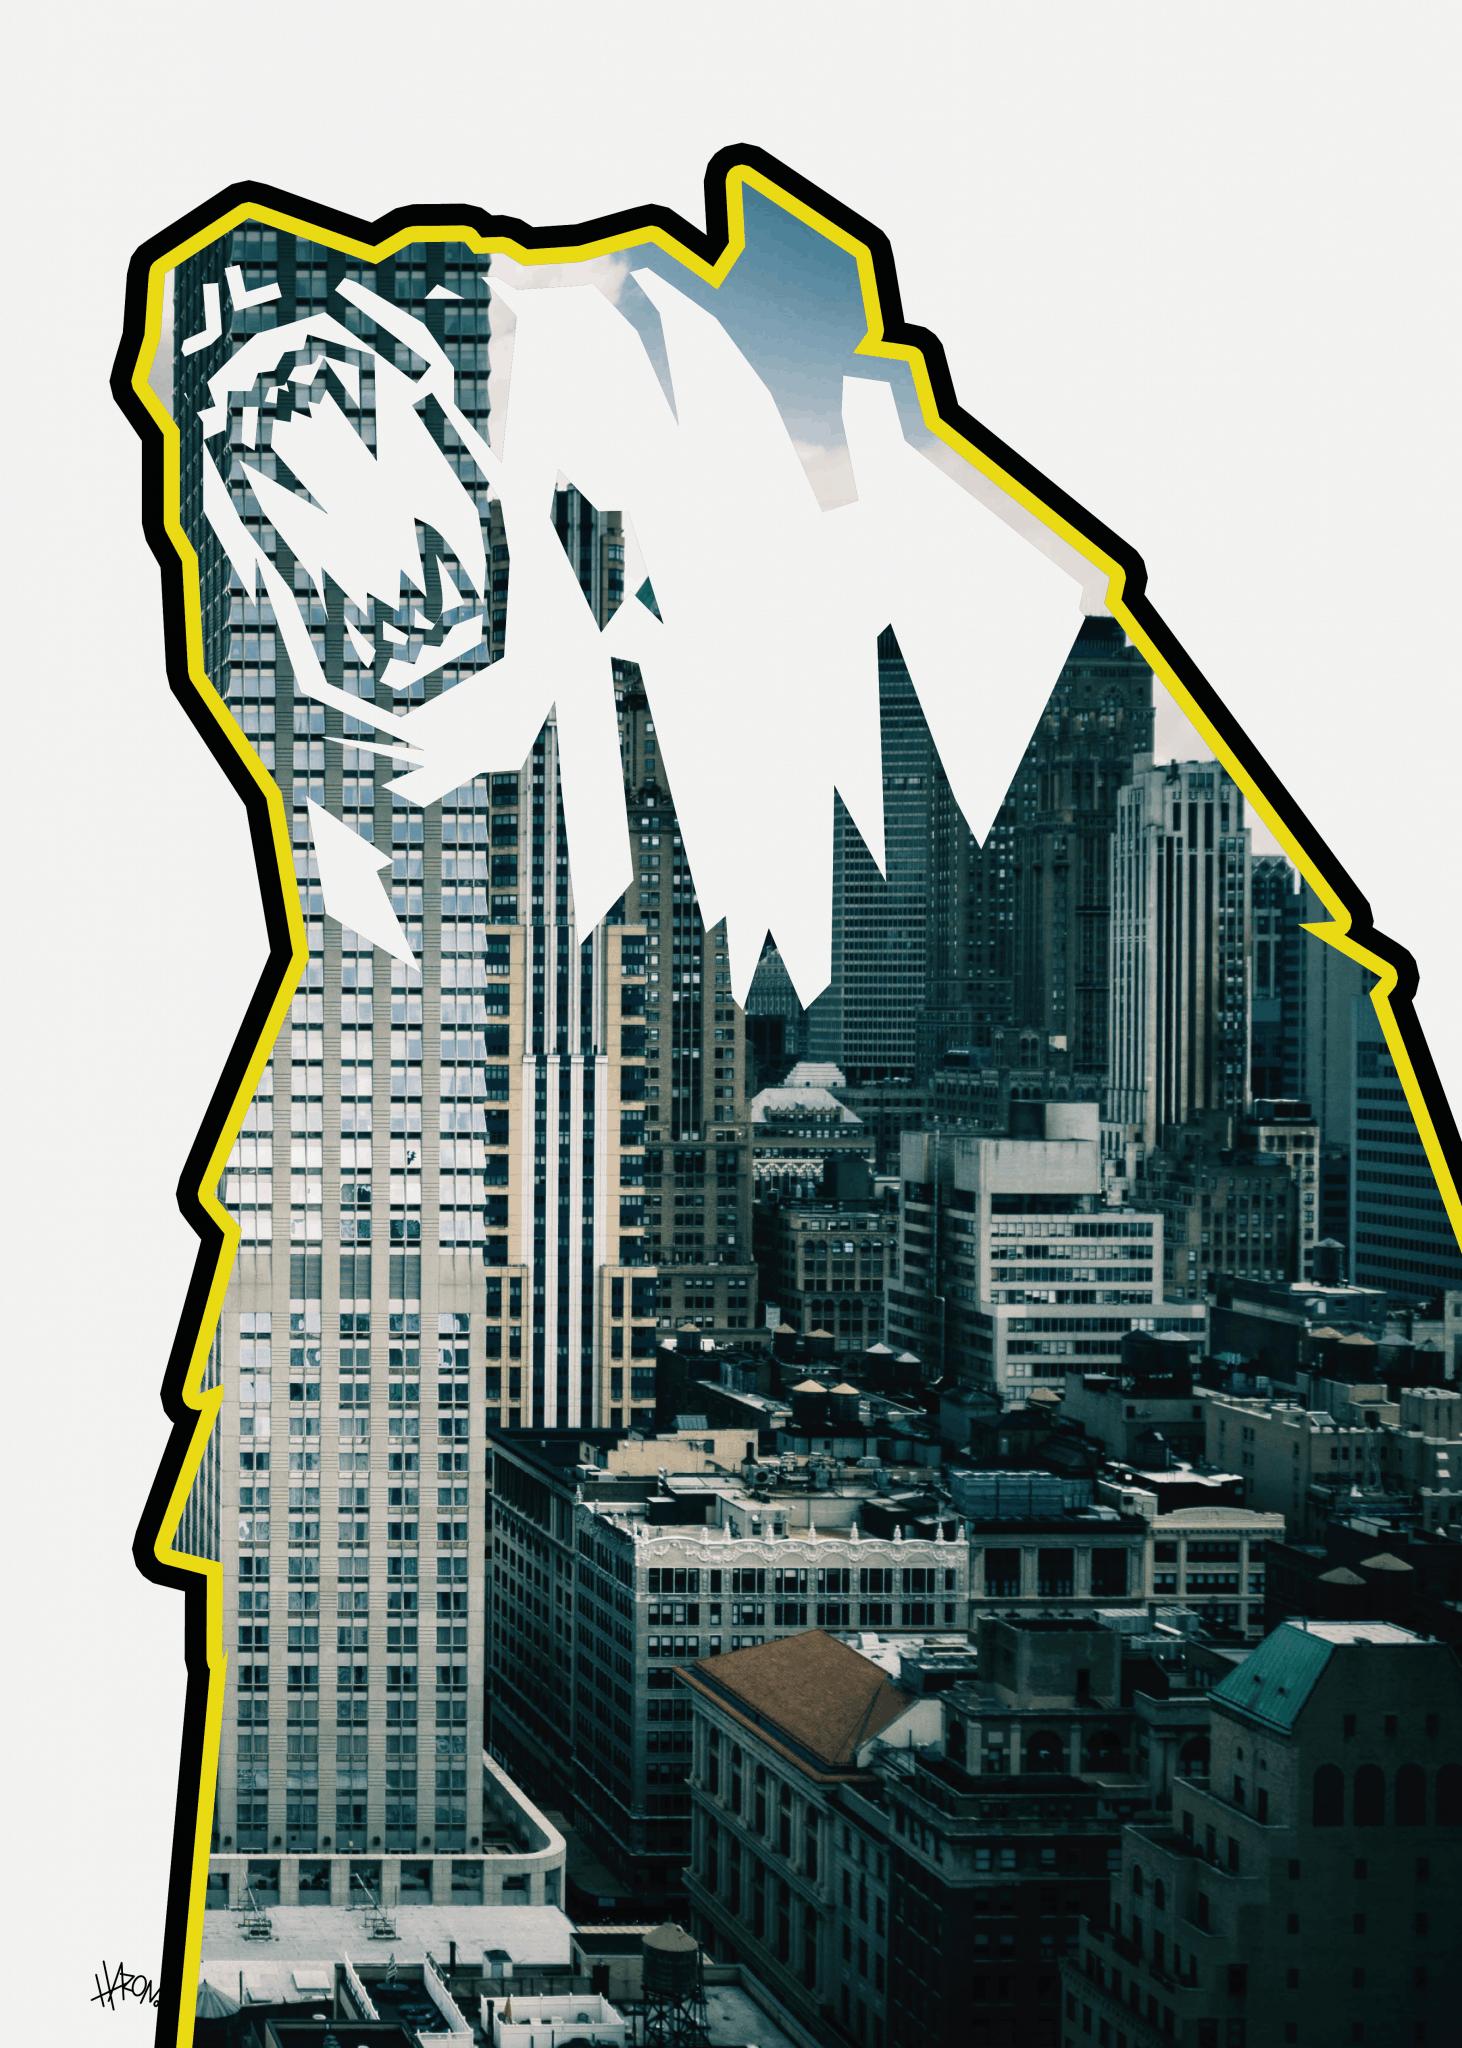 urso_urban-01